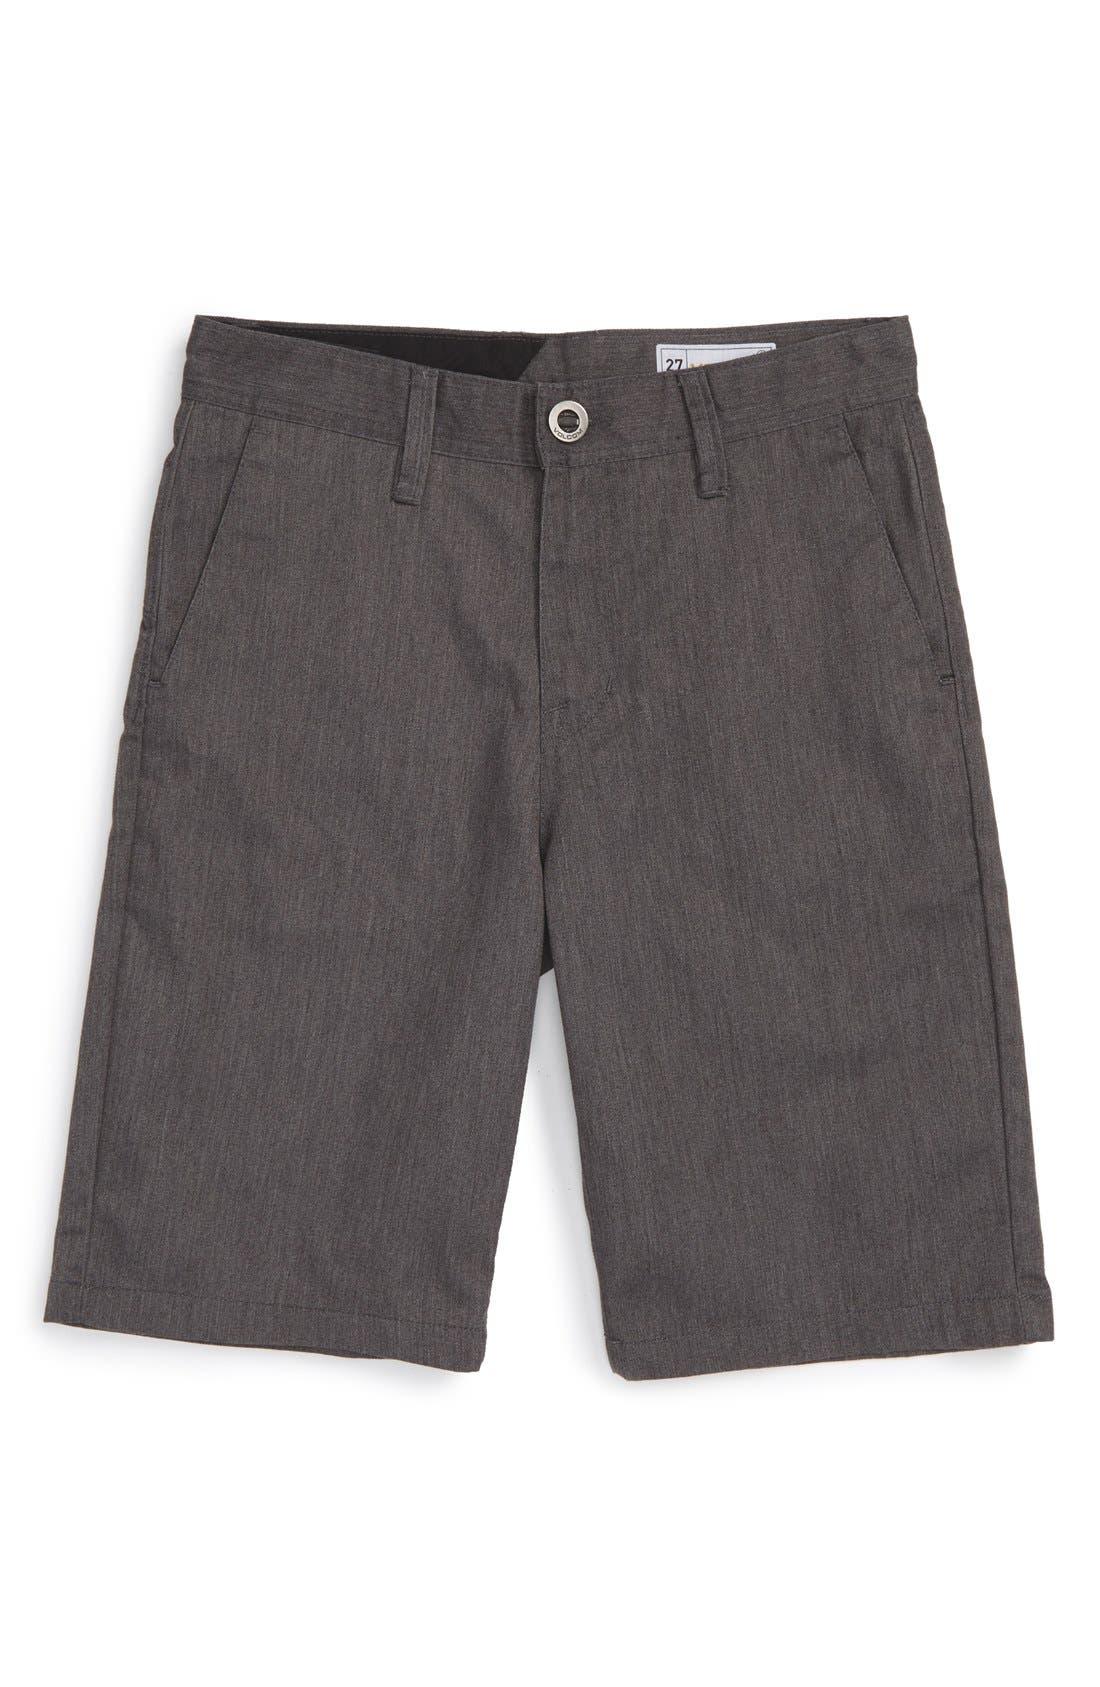 Alternate Image 1 Selected - Volcom Chino Shorts (Toddler Boys, Little Boys & Big Boys)